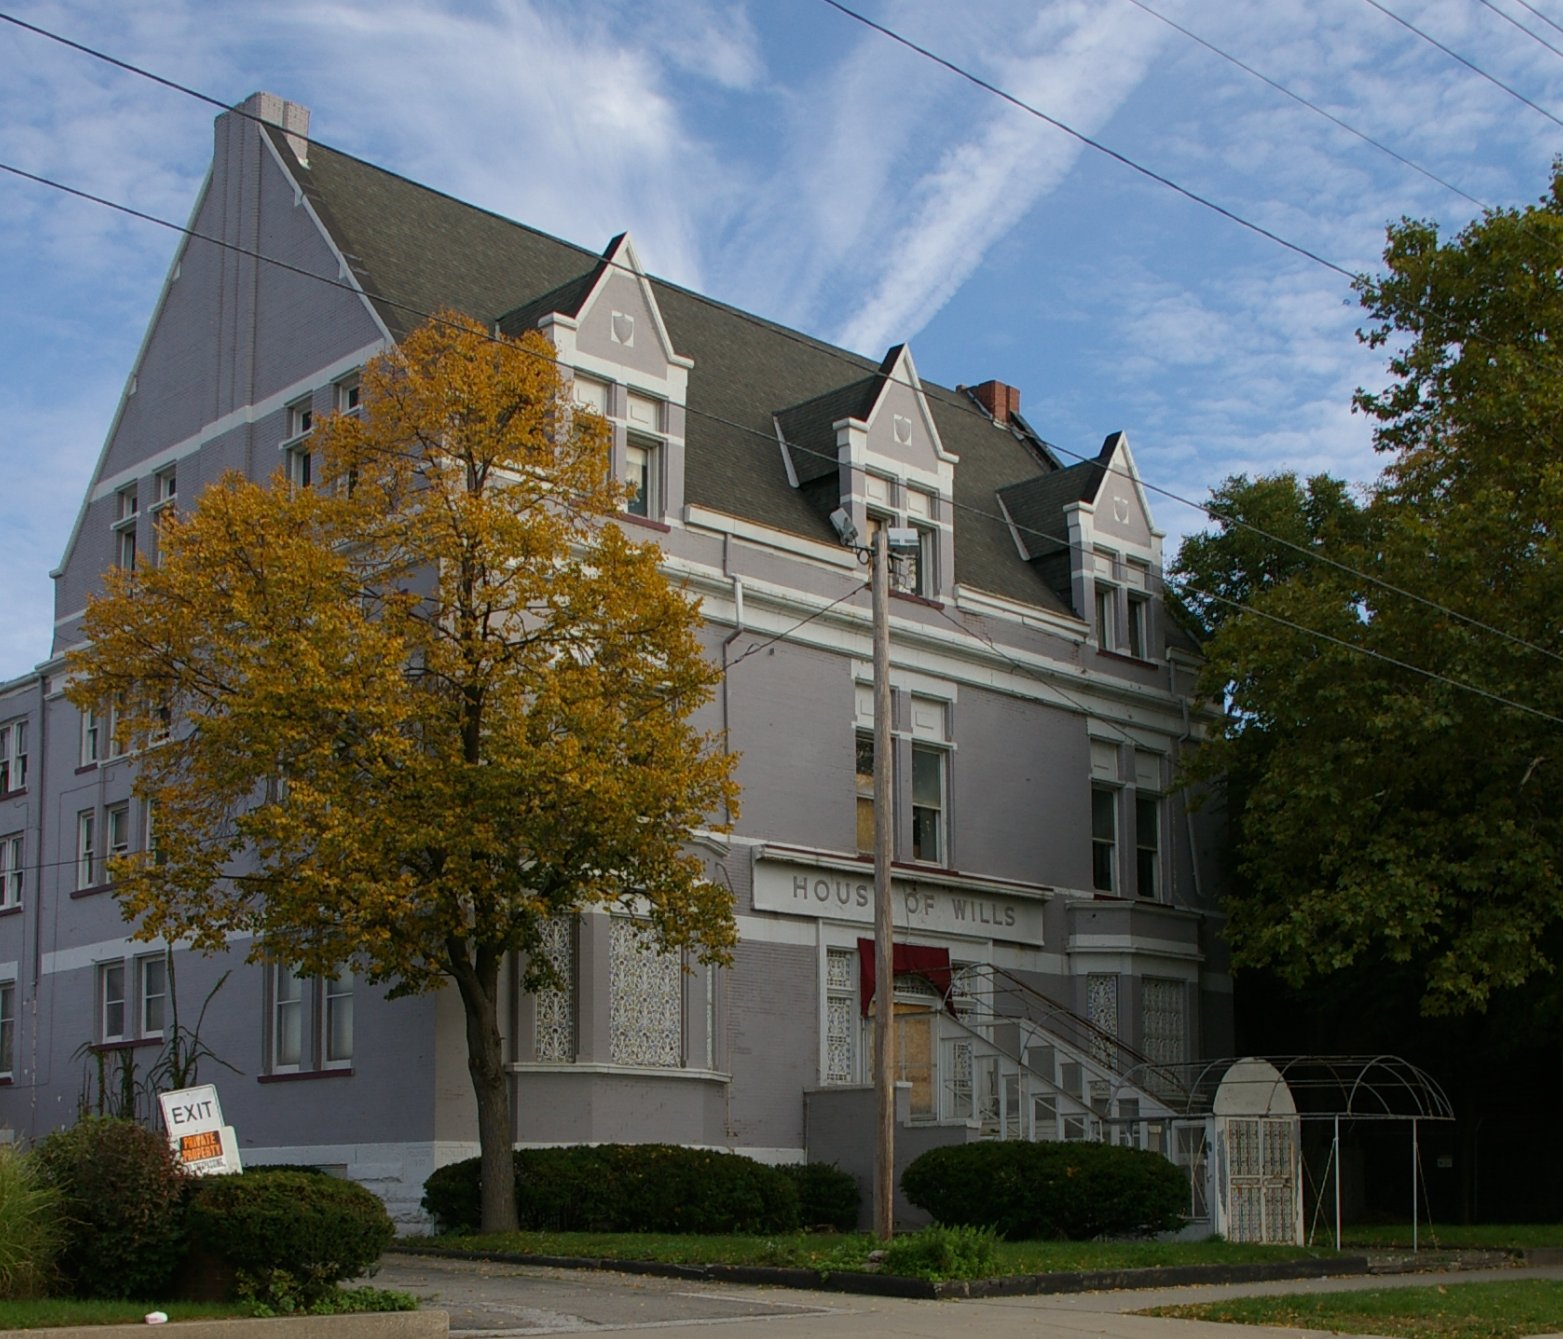 File:House of Wills Cleveland Ohio jpg - Wikimedia Commons